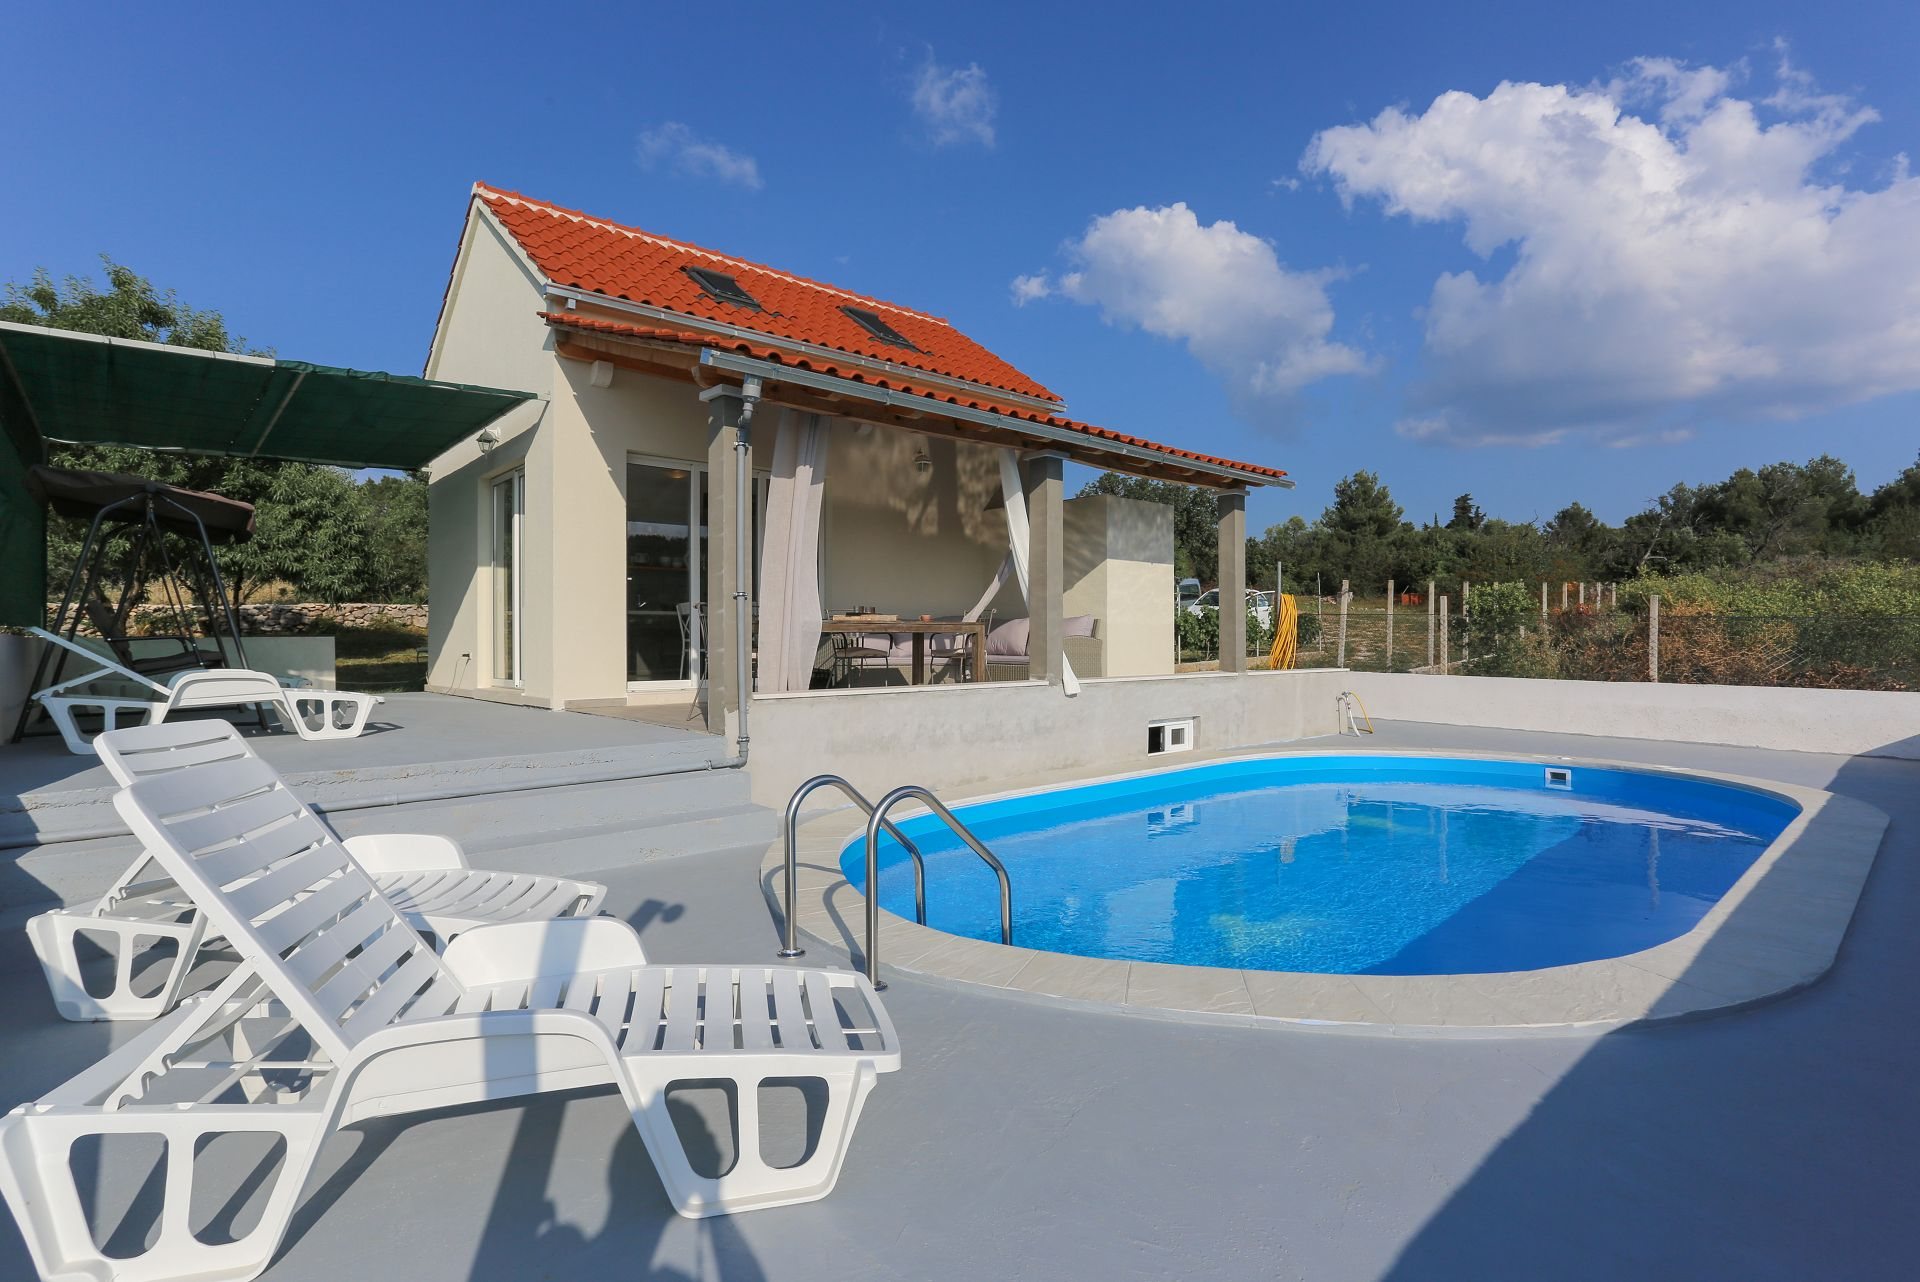 Baras garden - Mirca - Vakantiehuizen, villa´s Kroatië